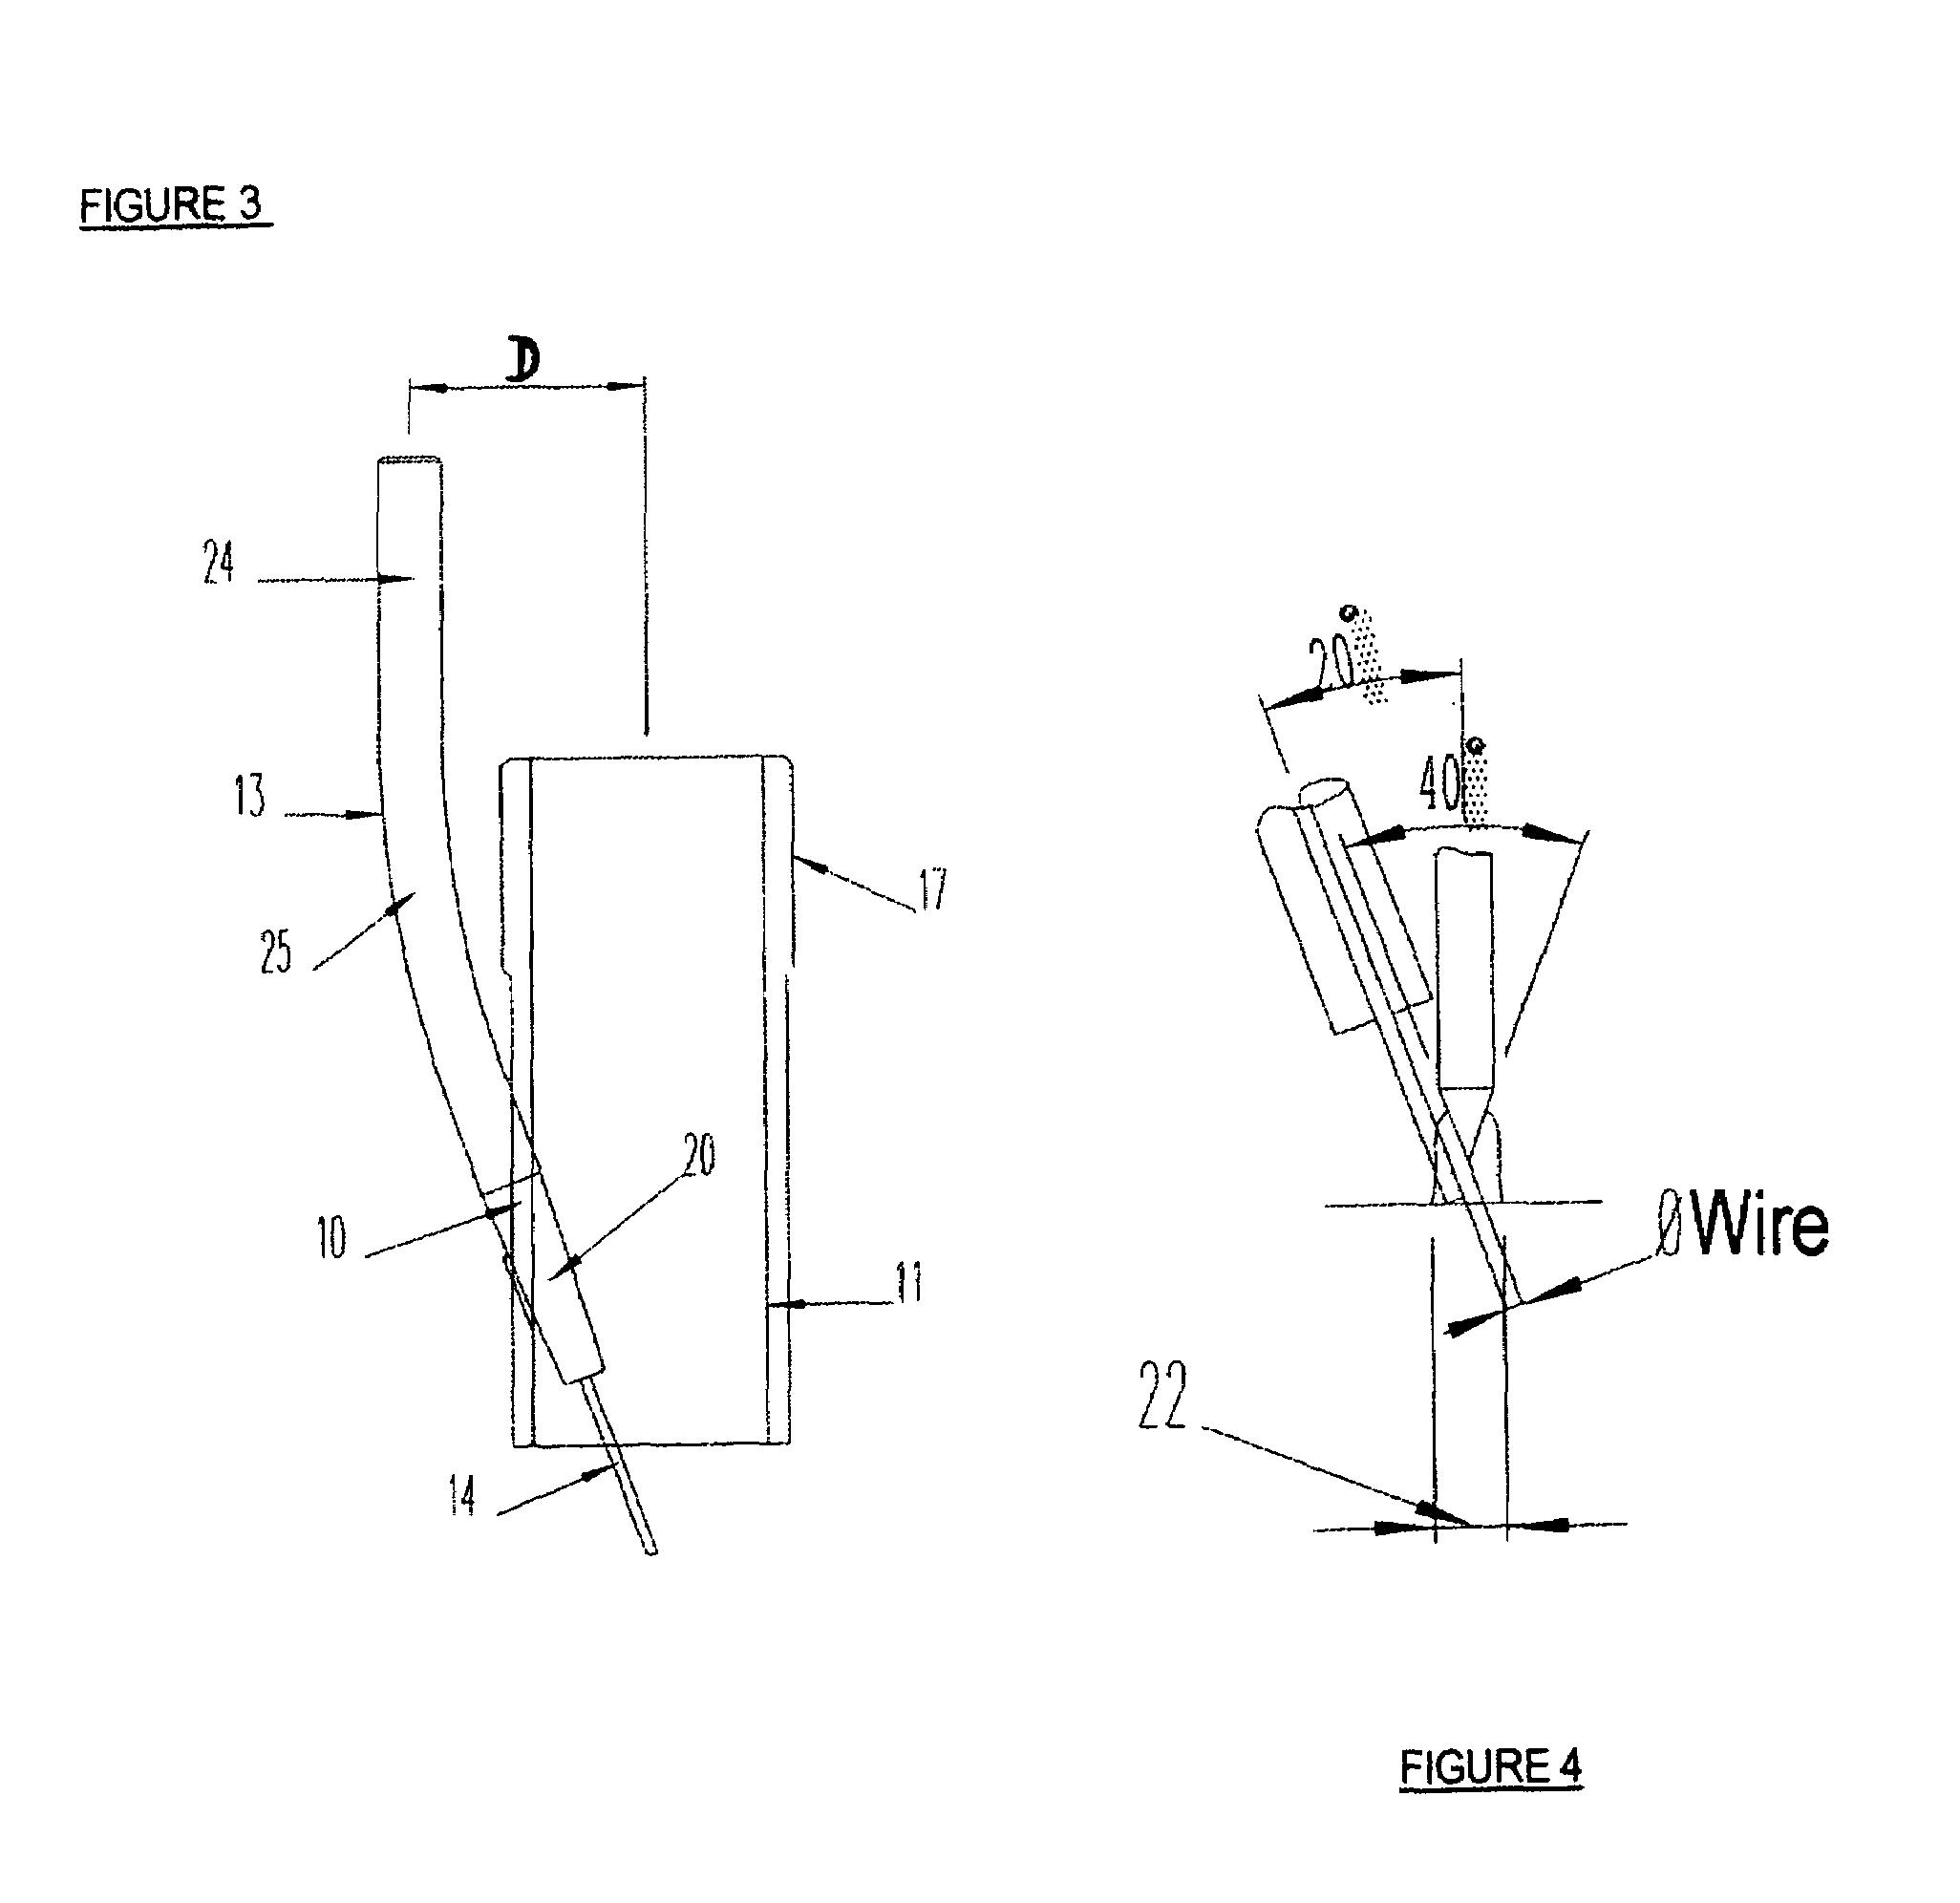 220 Welder Plug Wiring Diagram On 50 Welder Plug Wiring Diagram